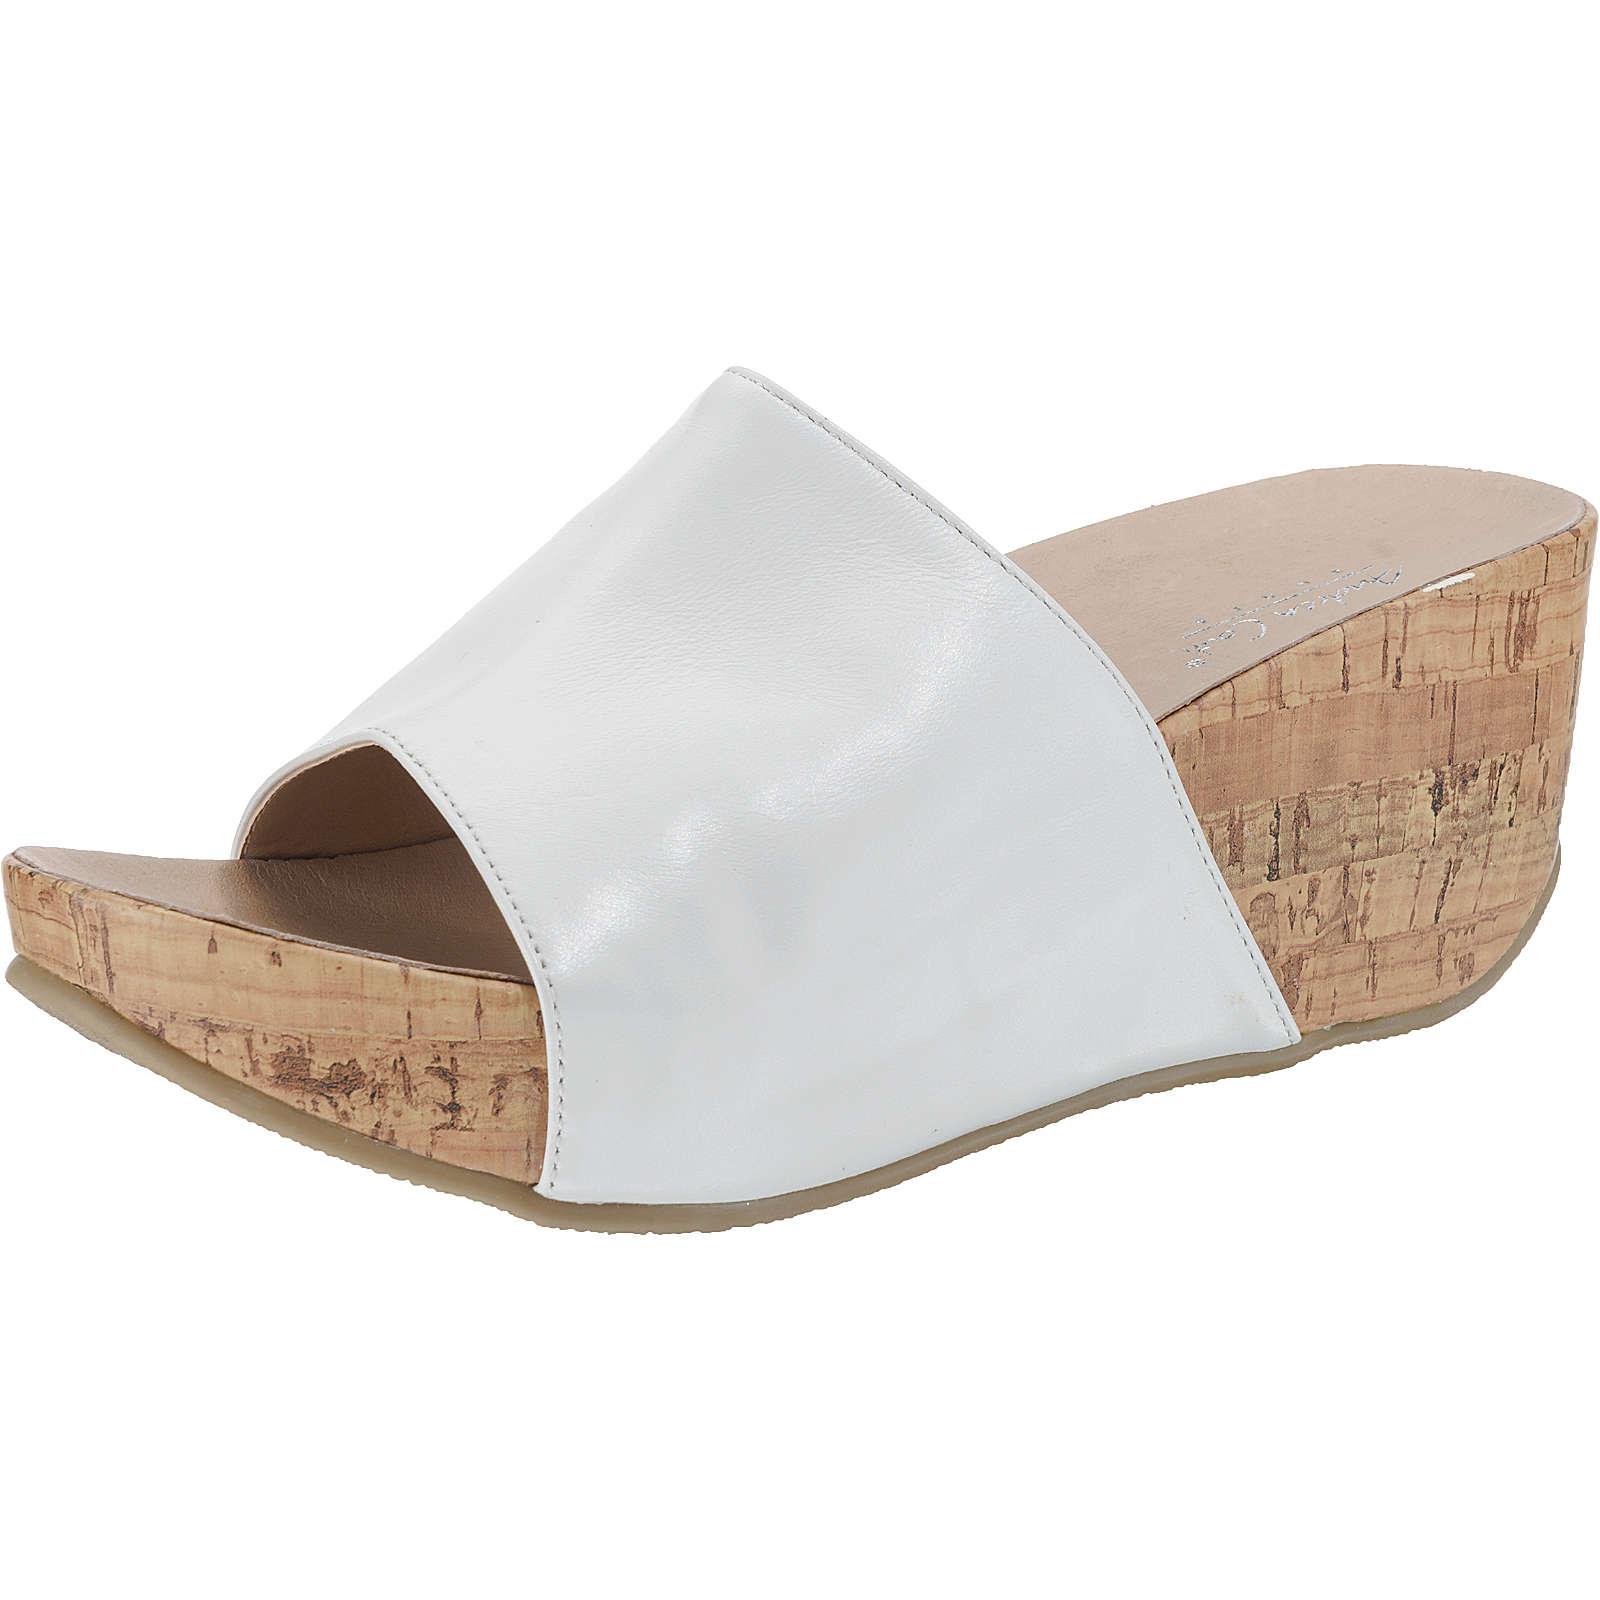 Andrea Conti Plateau-Pantoletten weiß Damen Gr. 42 jetztbilligerkaufen